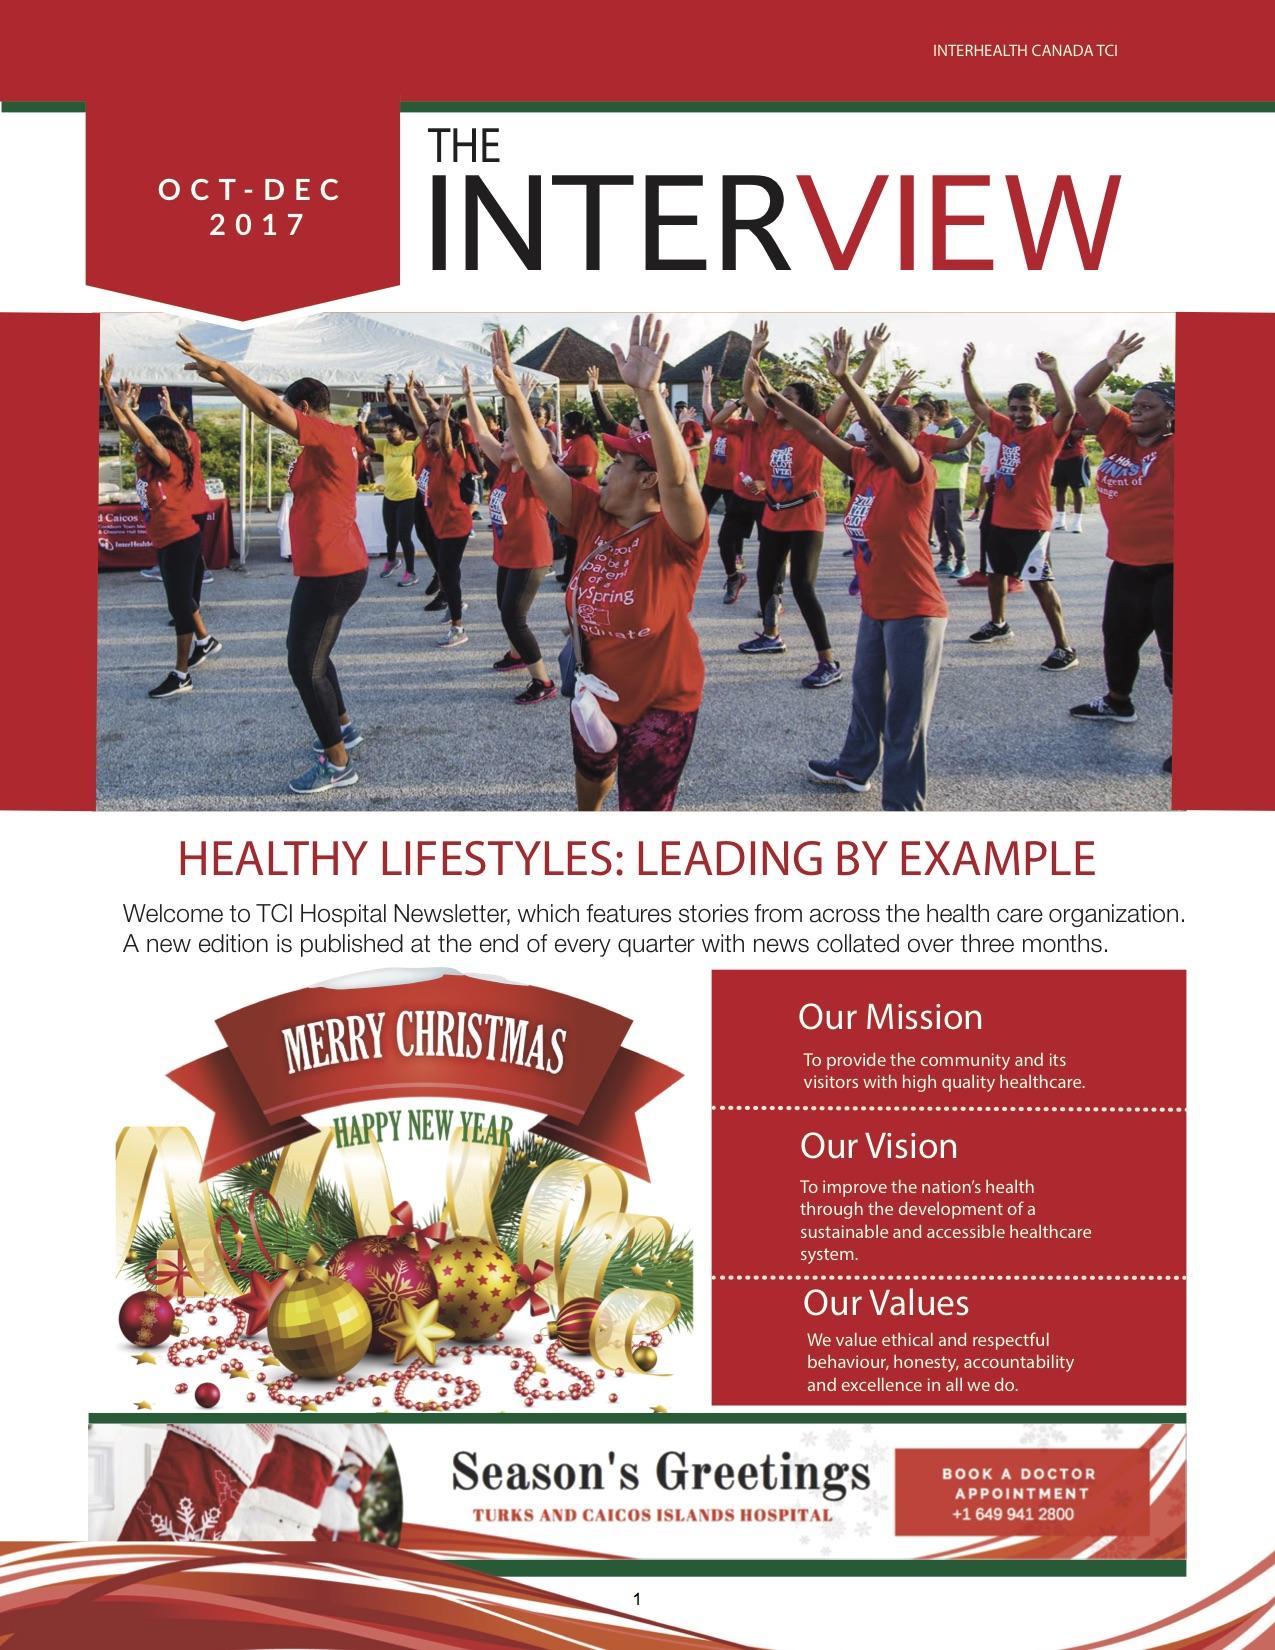 Oct-Dec 2017 Newsletter